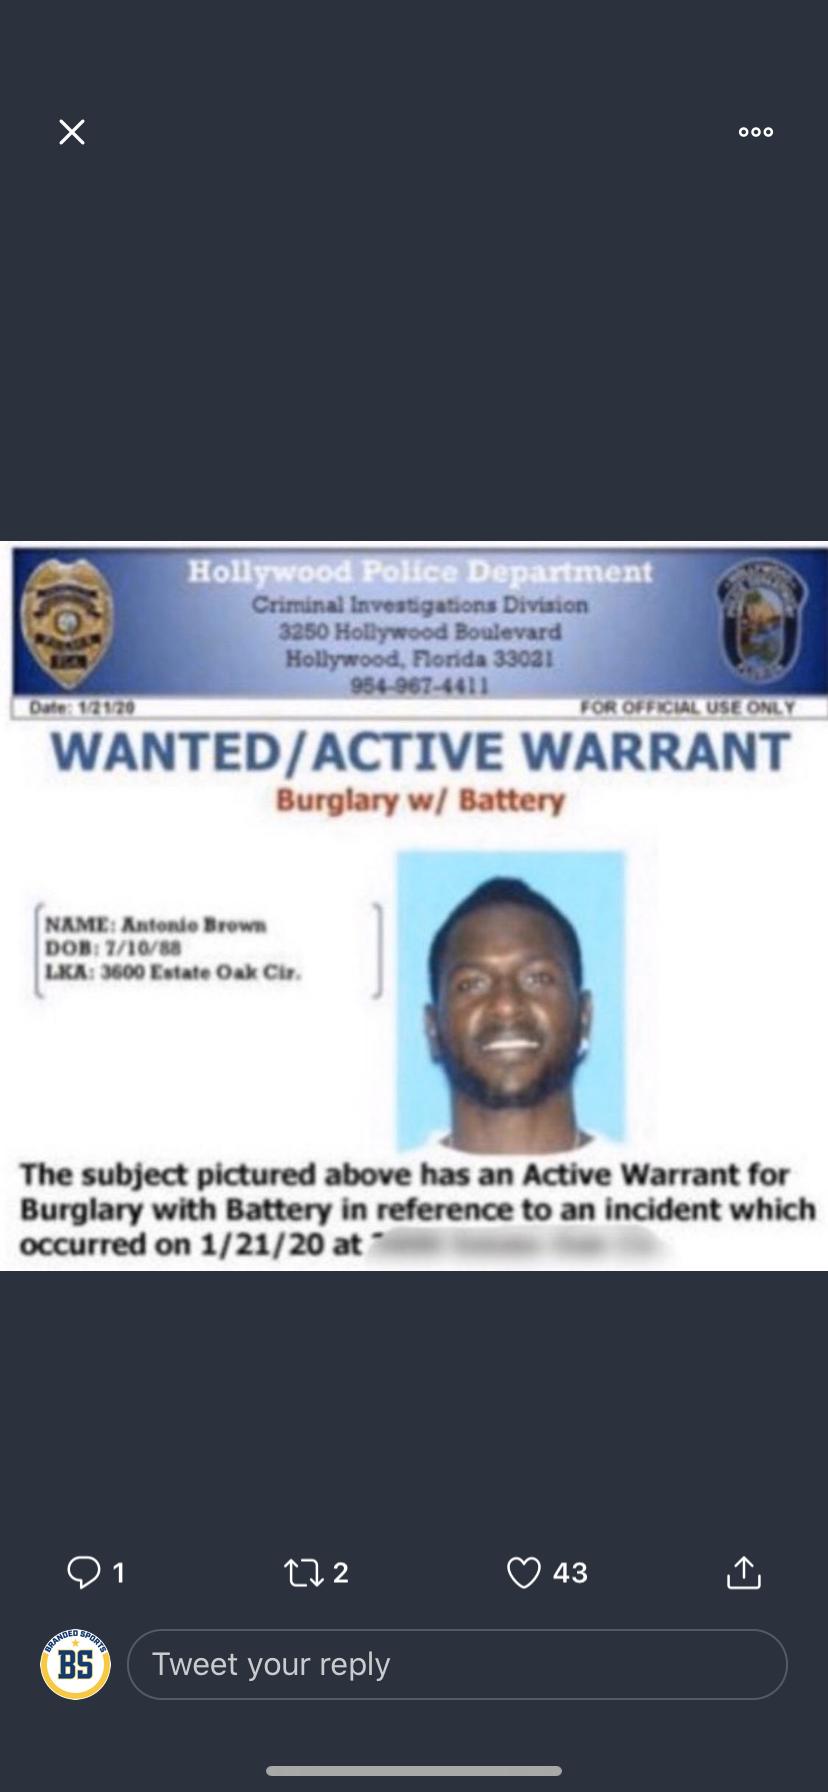 Antonio Brown Turns Himself Into Police